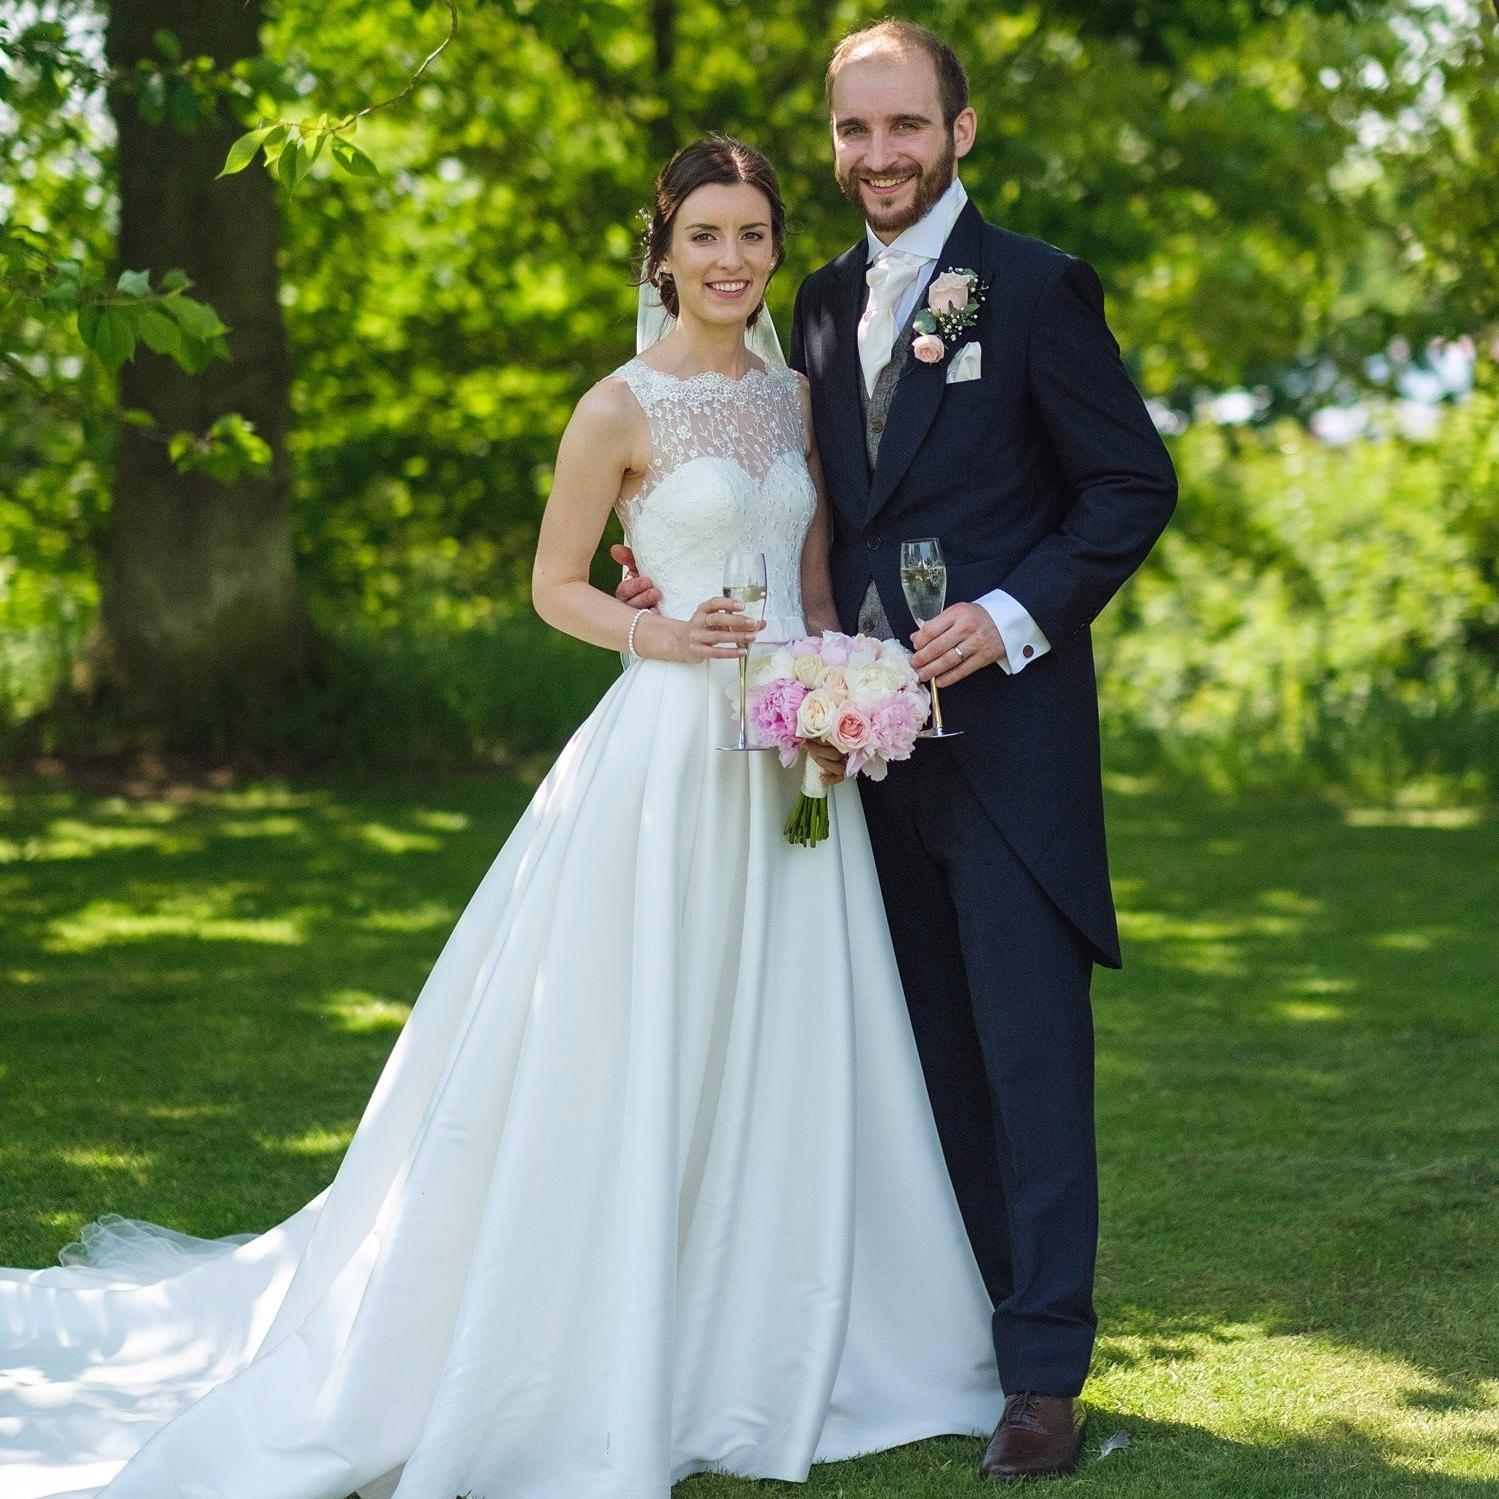 Kristin and Luke Real Wedding - Triangle Nursery Ltd